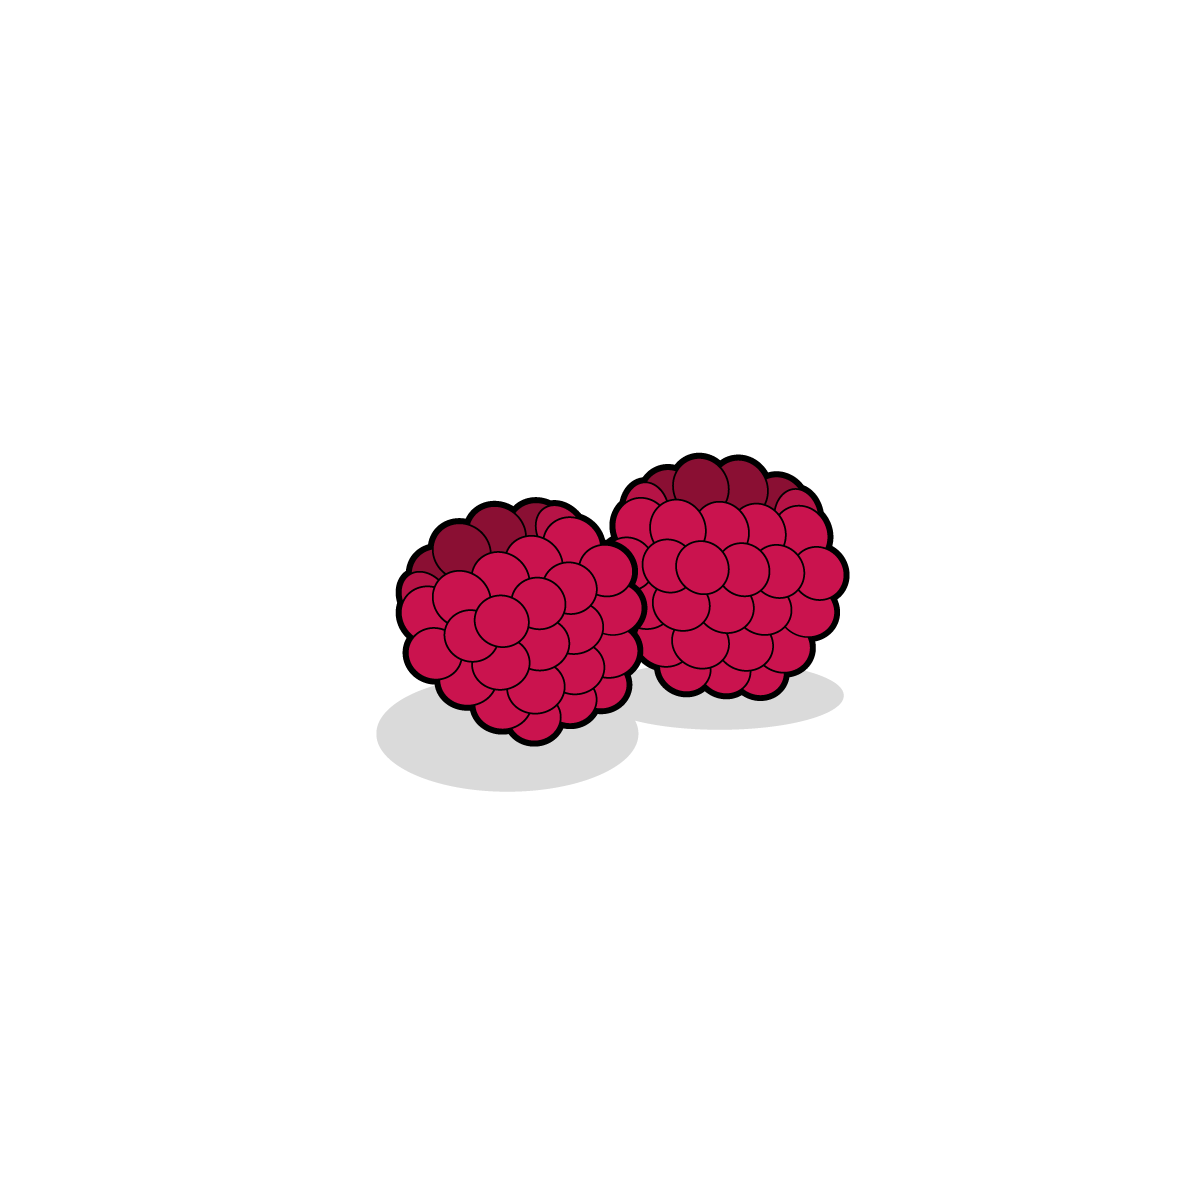 Icone de framboises, ailmacocotte.com